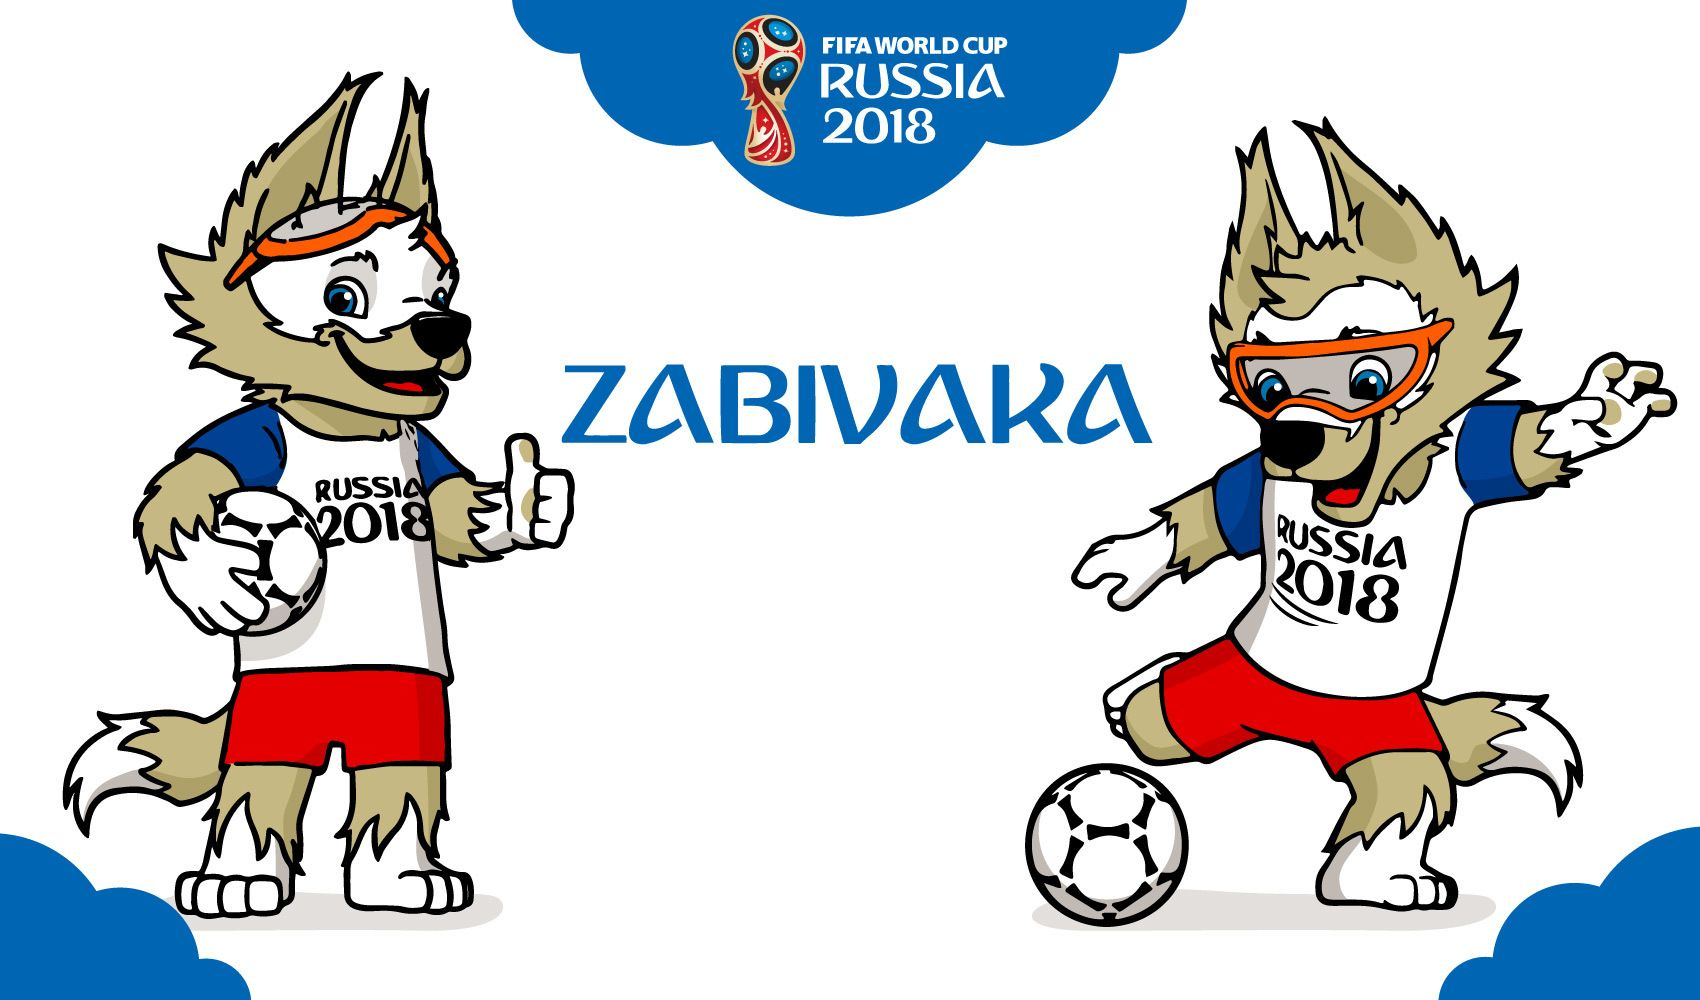 Rússia 2018 Copa do Mundo mascote Zabivaka - Baixar Vector c1c4d15e9ab2c